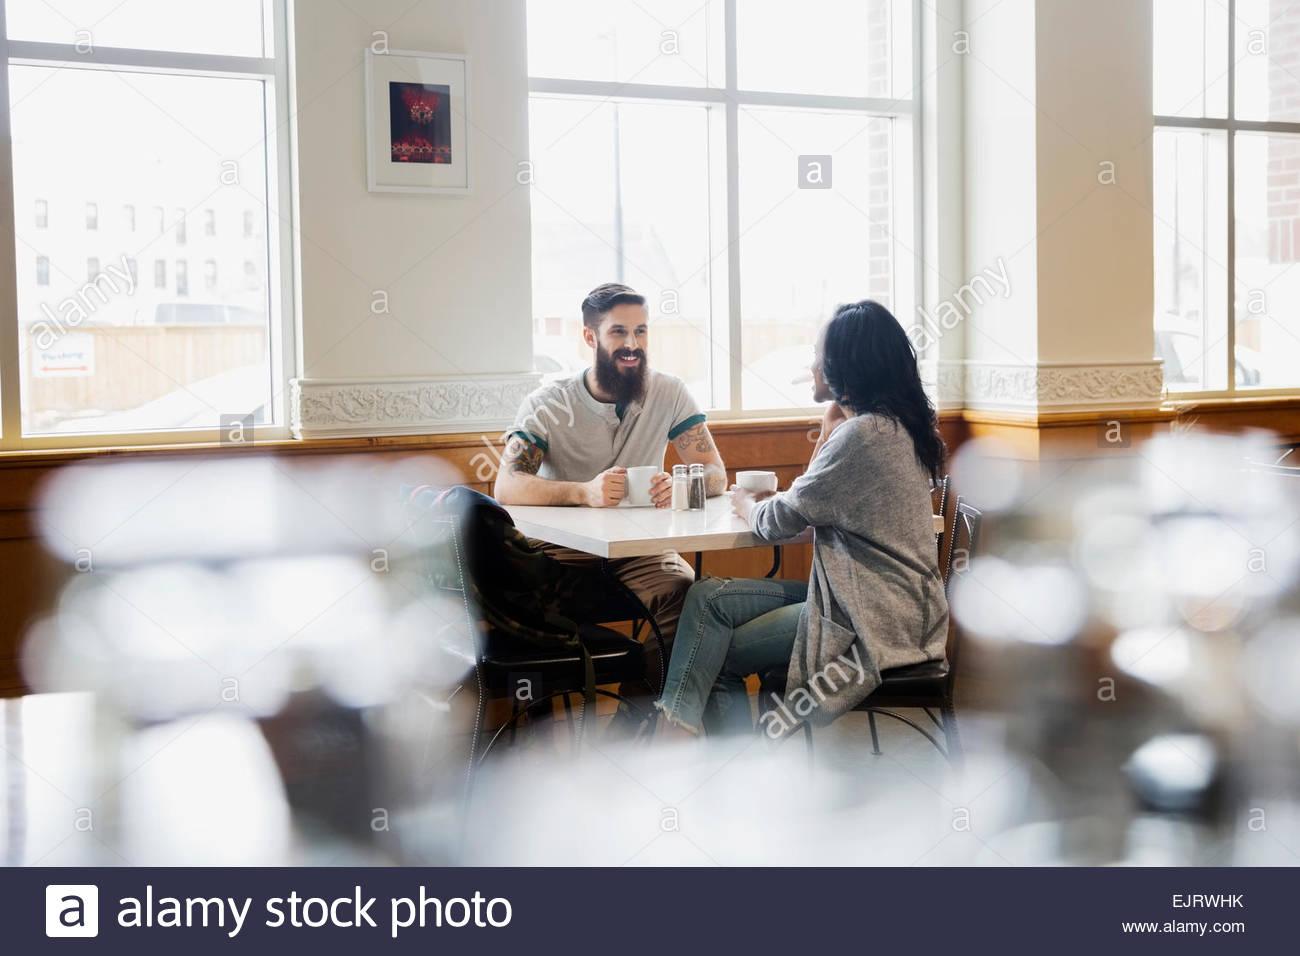 Par de beber café en la tabla Imagen De Stock